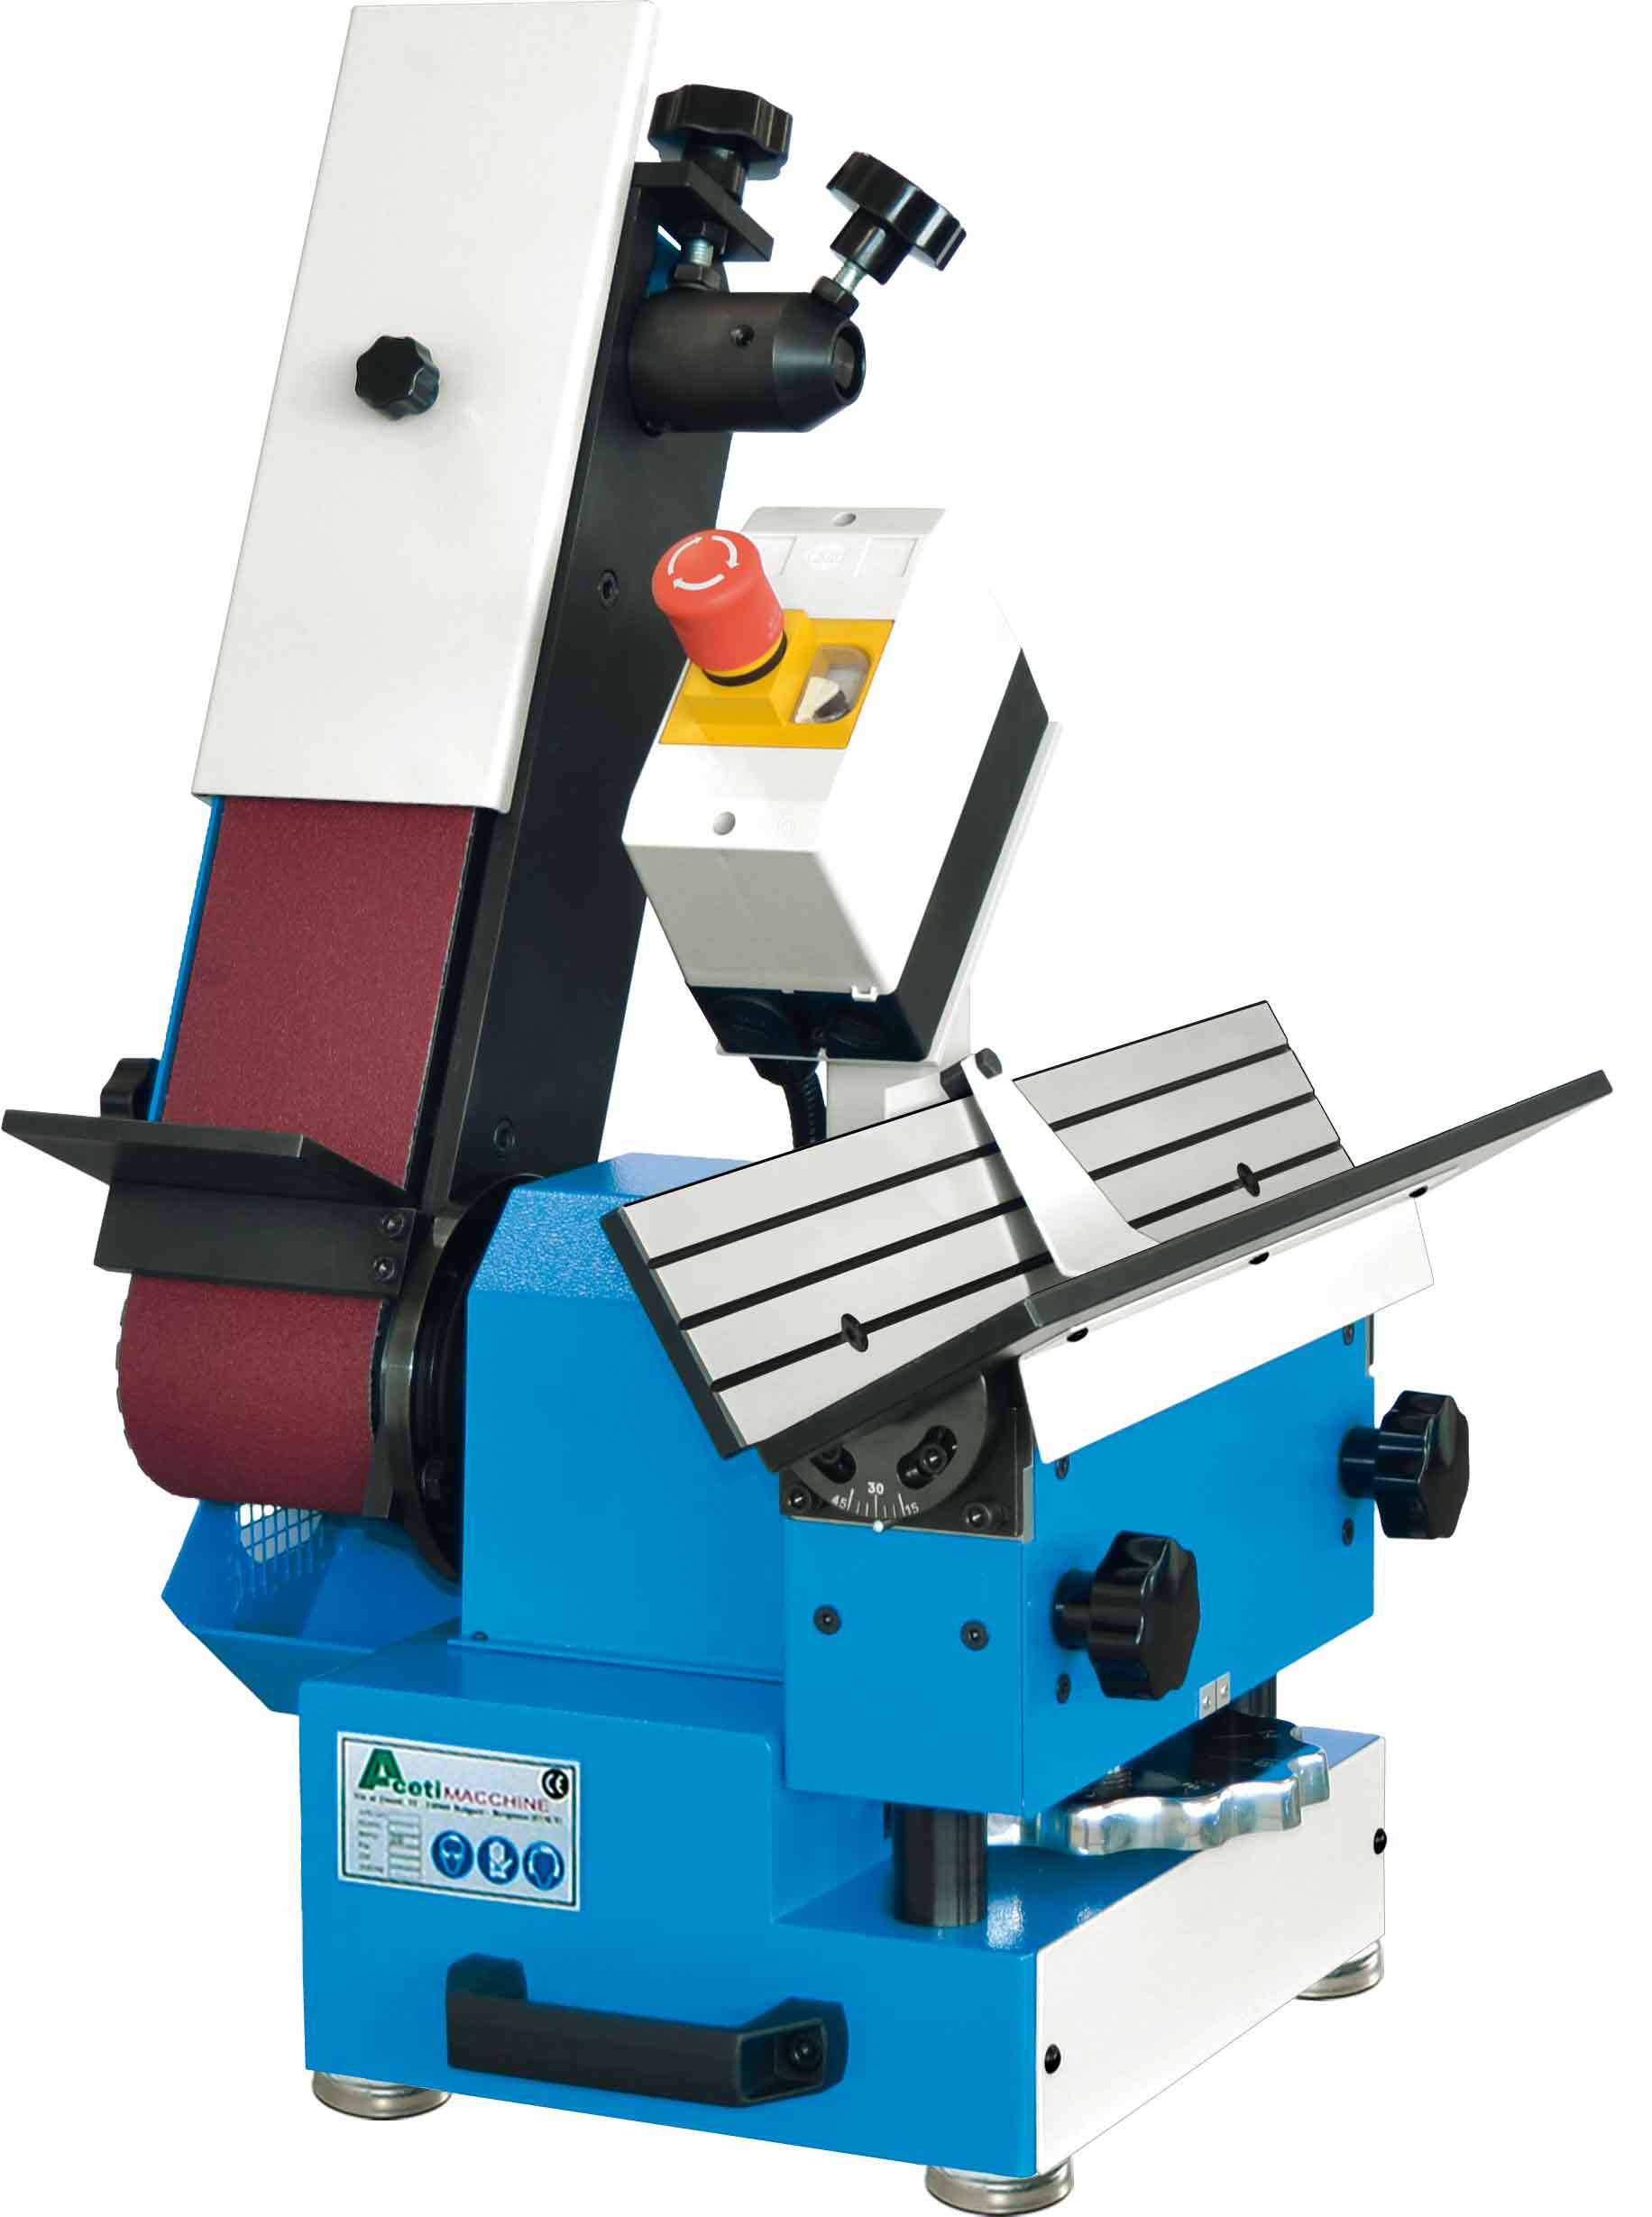 ART.83 - Bevelling machine